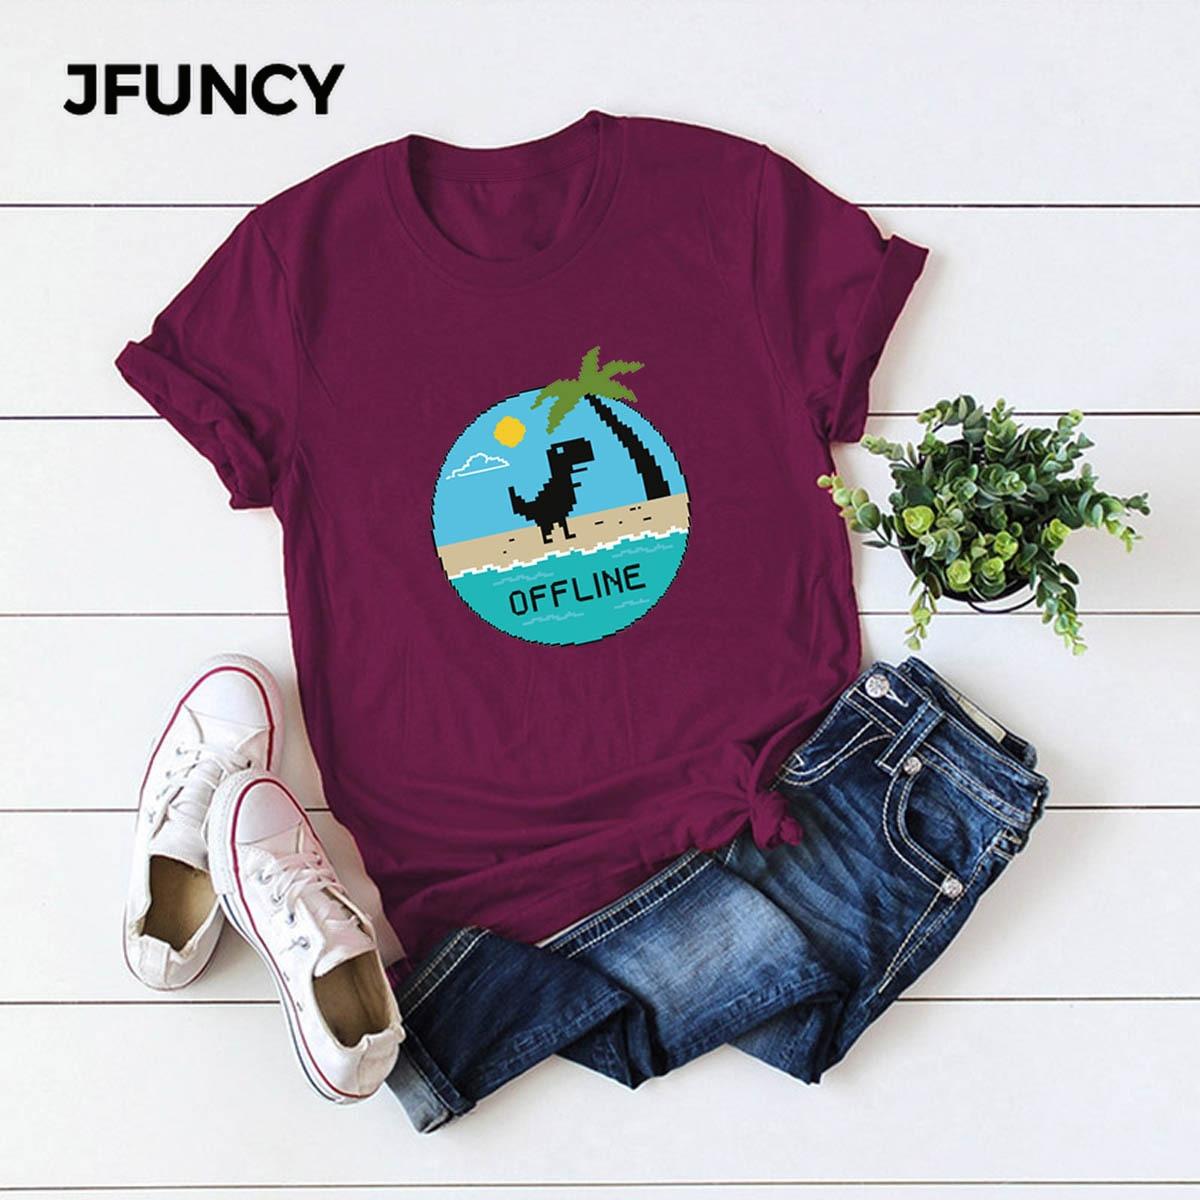 JFUNCY Funny Dinosaur Graphic Tees Women Tops 100% Cotton Summer T-shirt Plus Size Short Sleeve Woman Shirts Lady Casual Tshirt